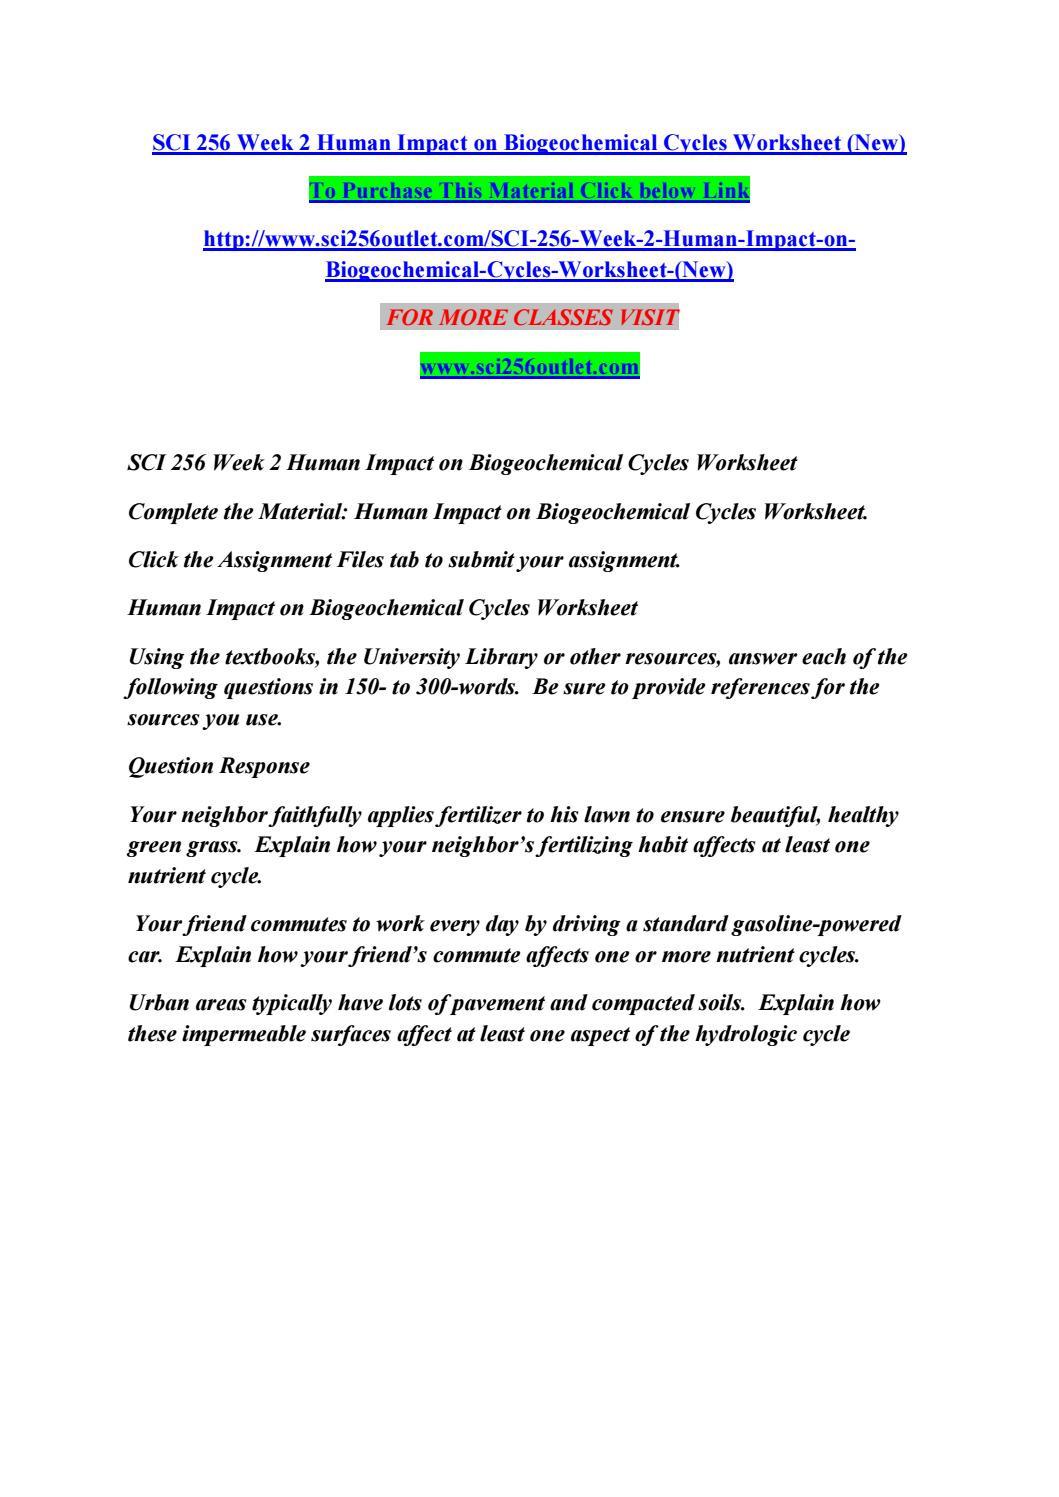 Nutrient Cycles Worksheet Answers Sci 256 Week 2 Human Impact On Biogeochemical Cycles